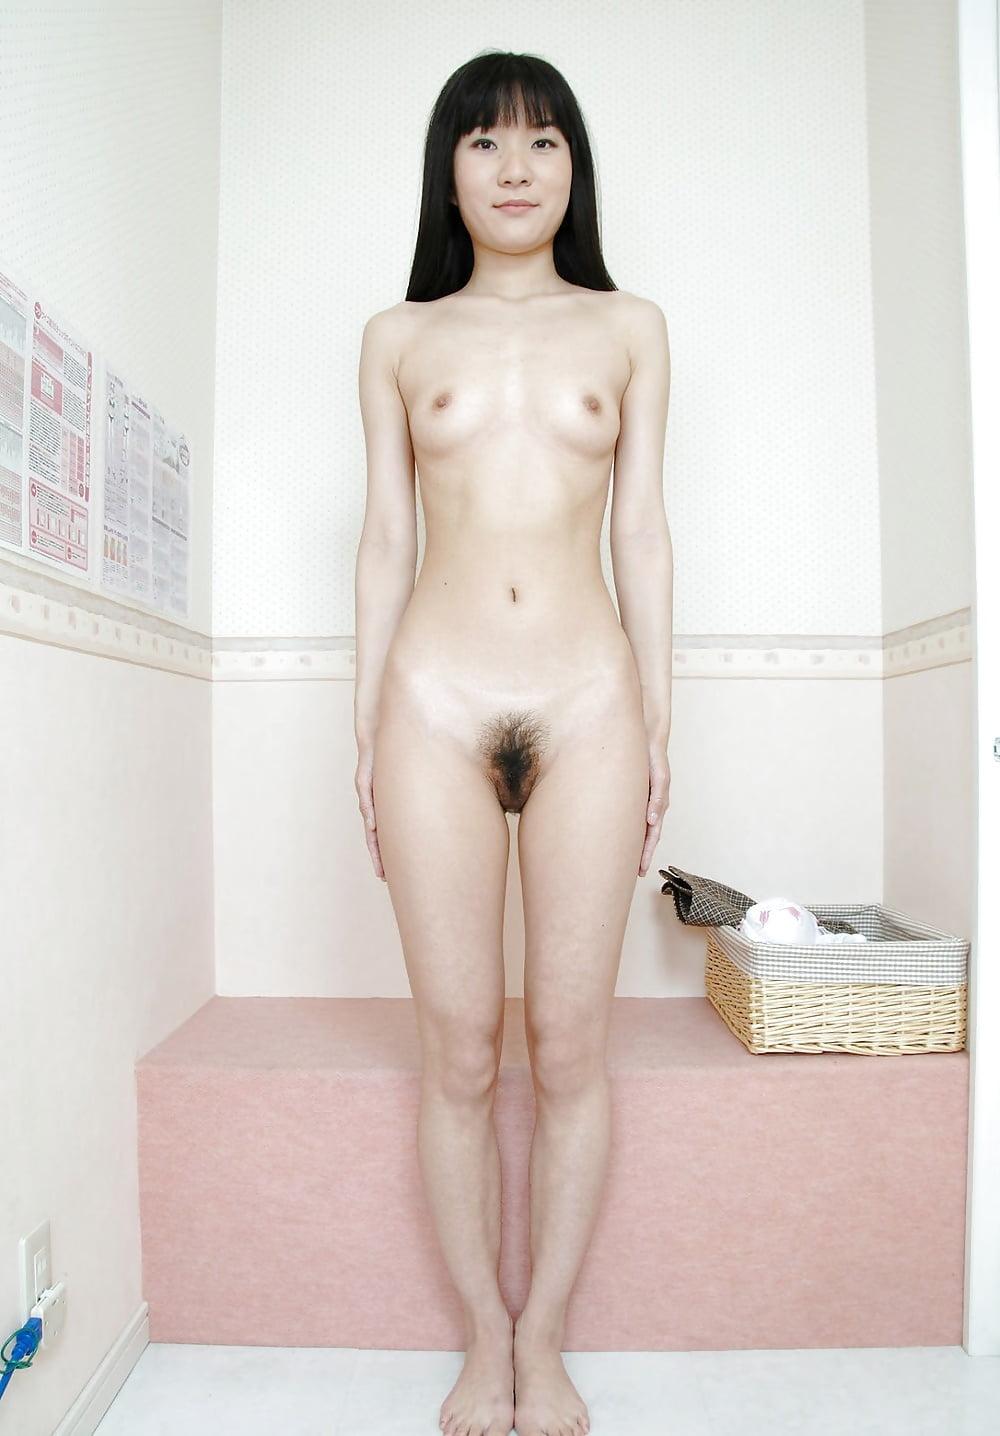 mature need nude Japan woman